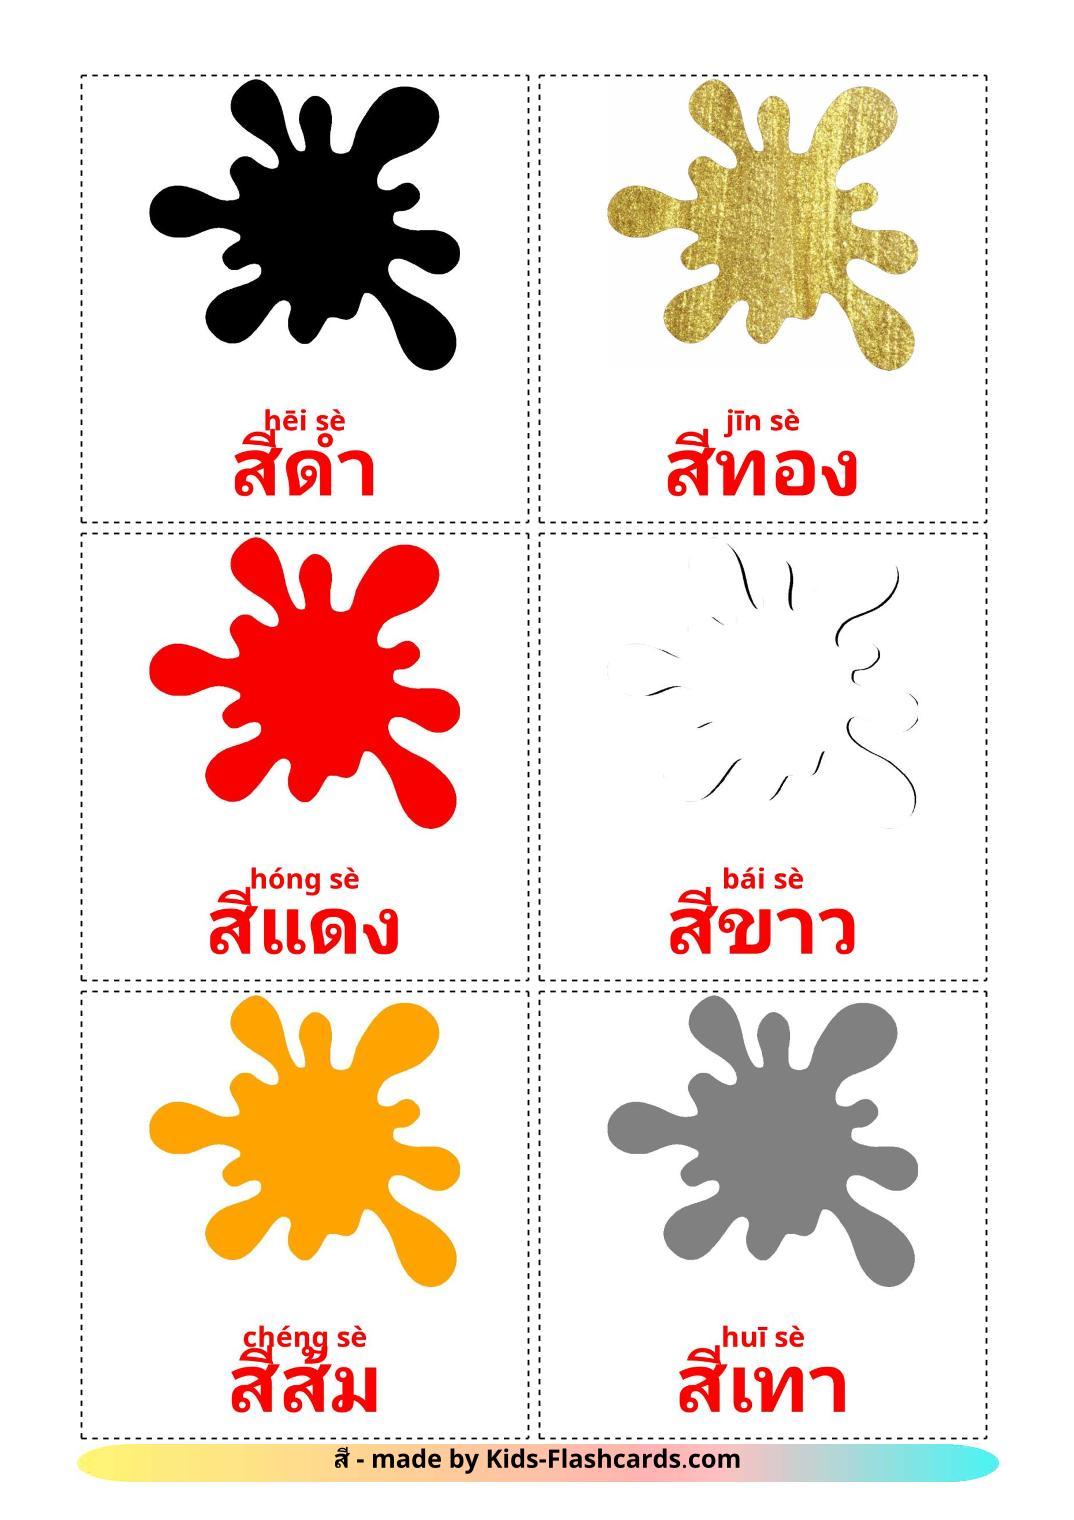 Base colors - 12 Free Printable thai Flashcards